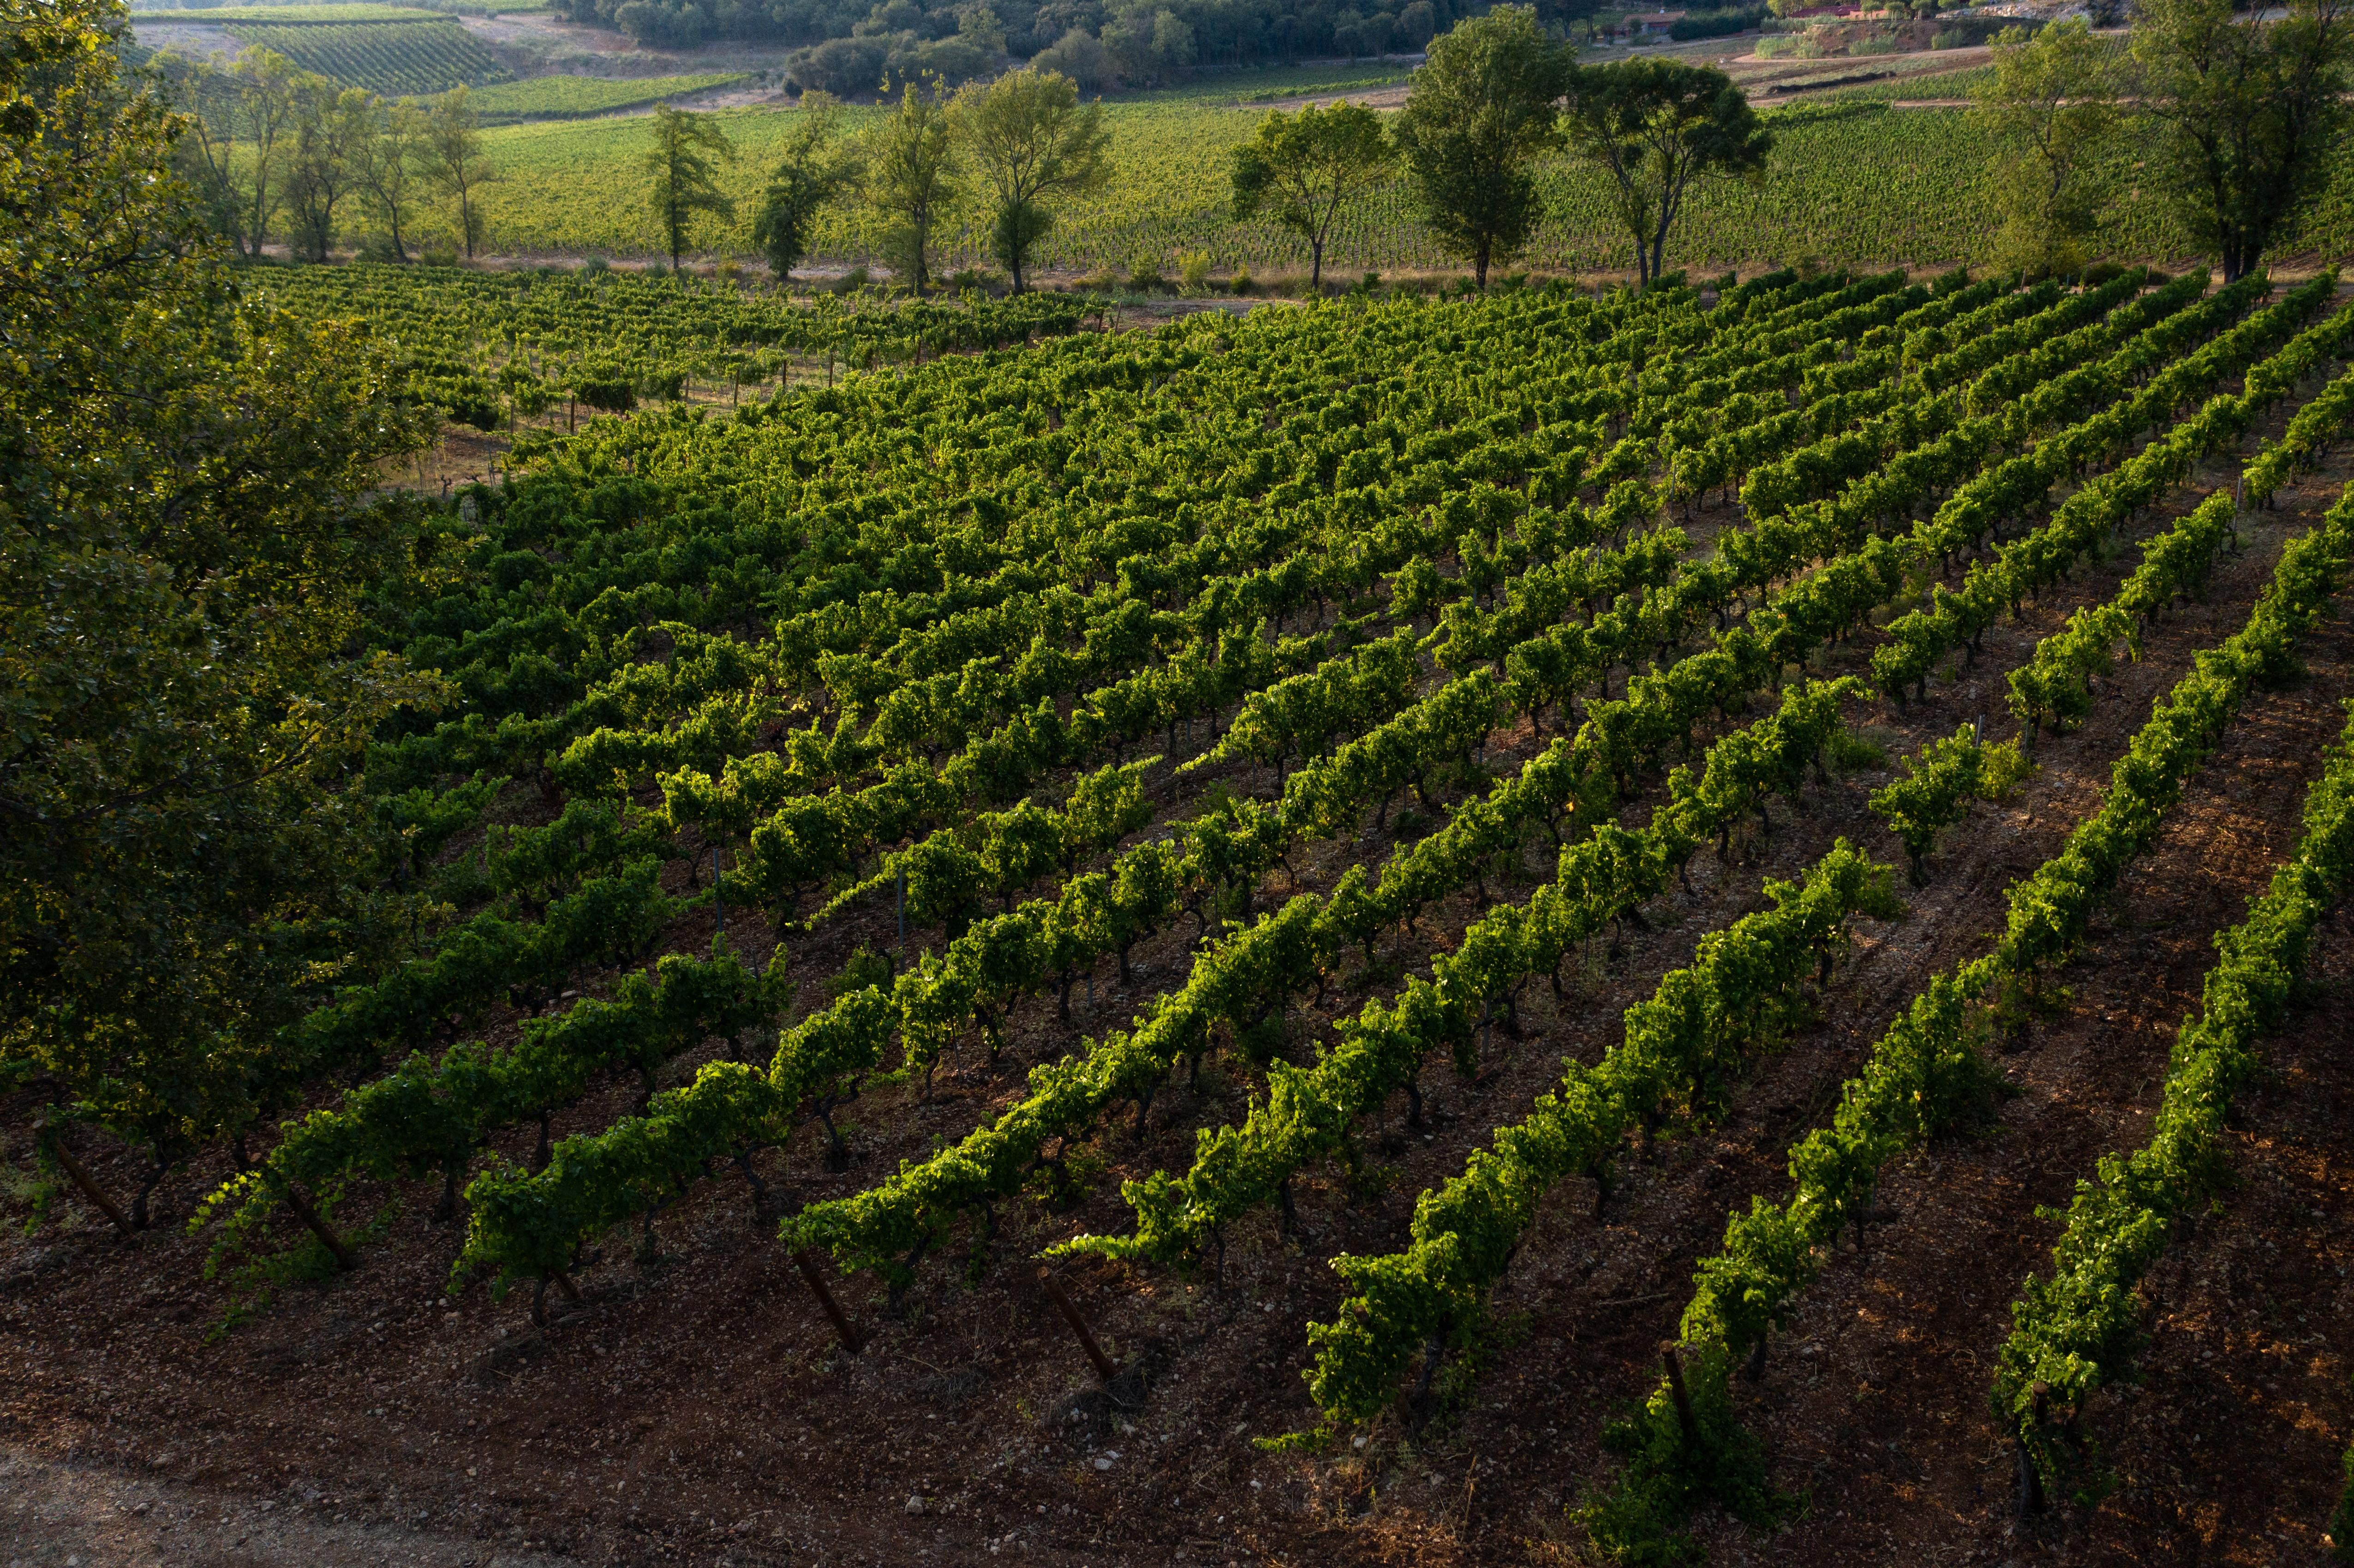 Vignoble - vineyard